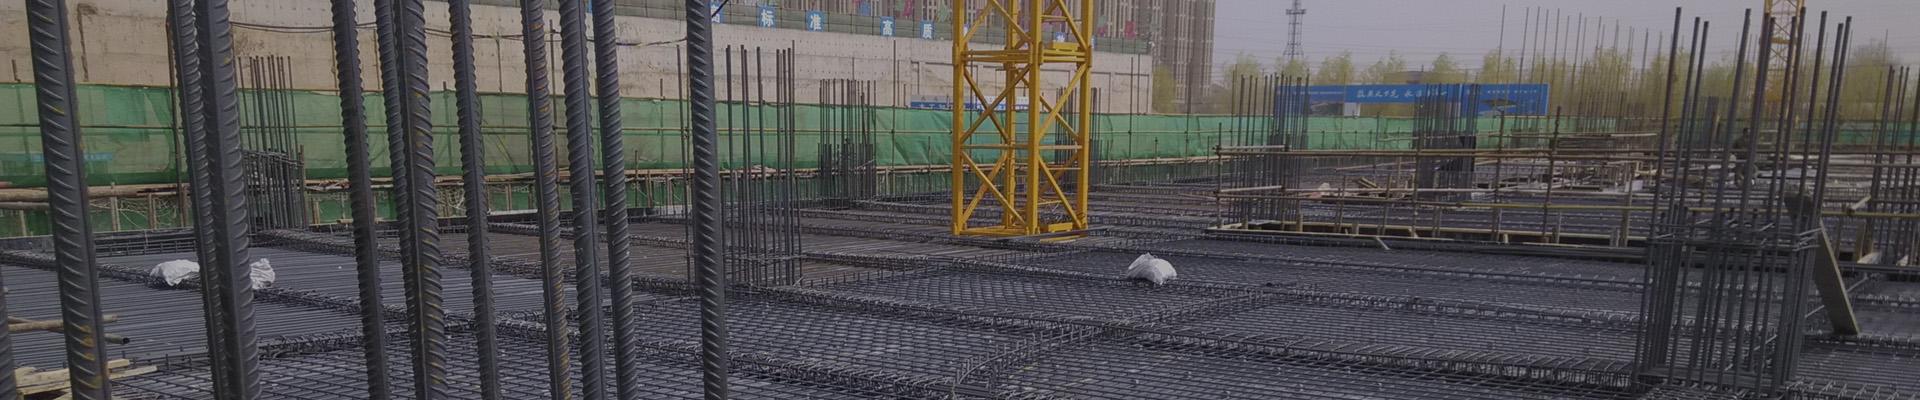 <p>建筑工程質量檢測</p><p>主體結構檢測、鋼結構檢測、地基基礎檢測、空氣質量檢測</p><span>咨詢熱線:15925123652</span>